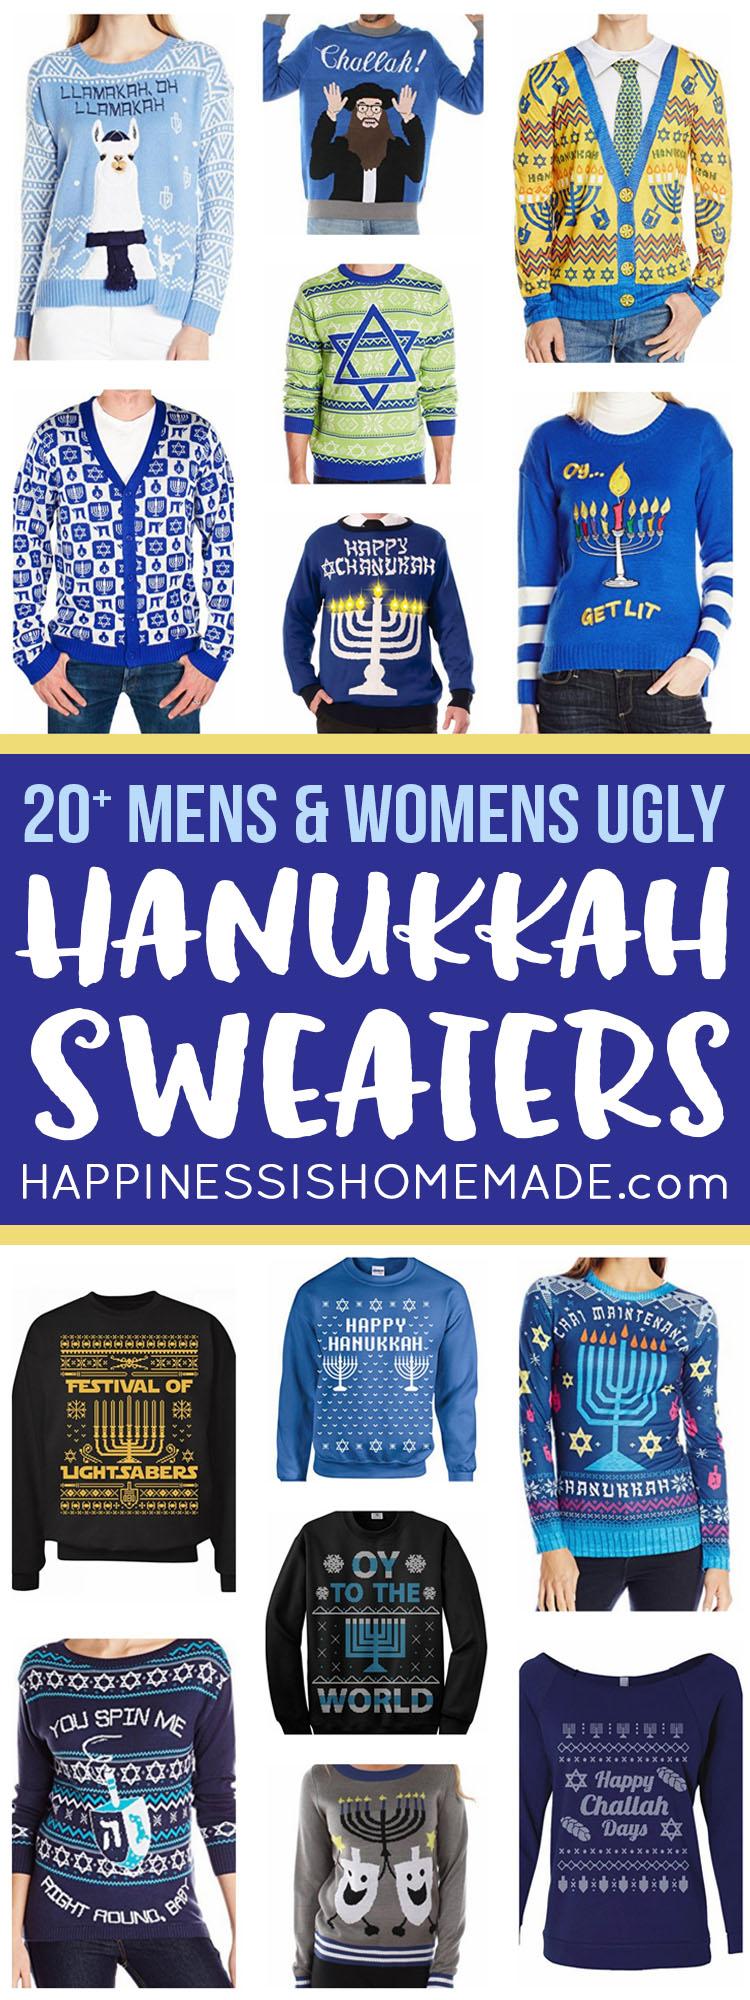 Happy Llamakah Ugly Sweater Youth Sweatshirt Hanukkah Holiday Gift